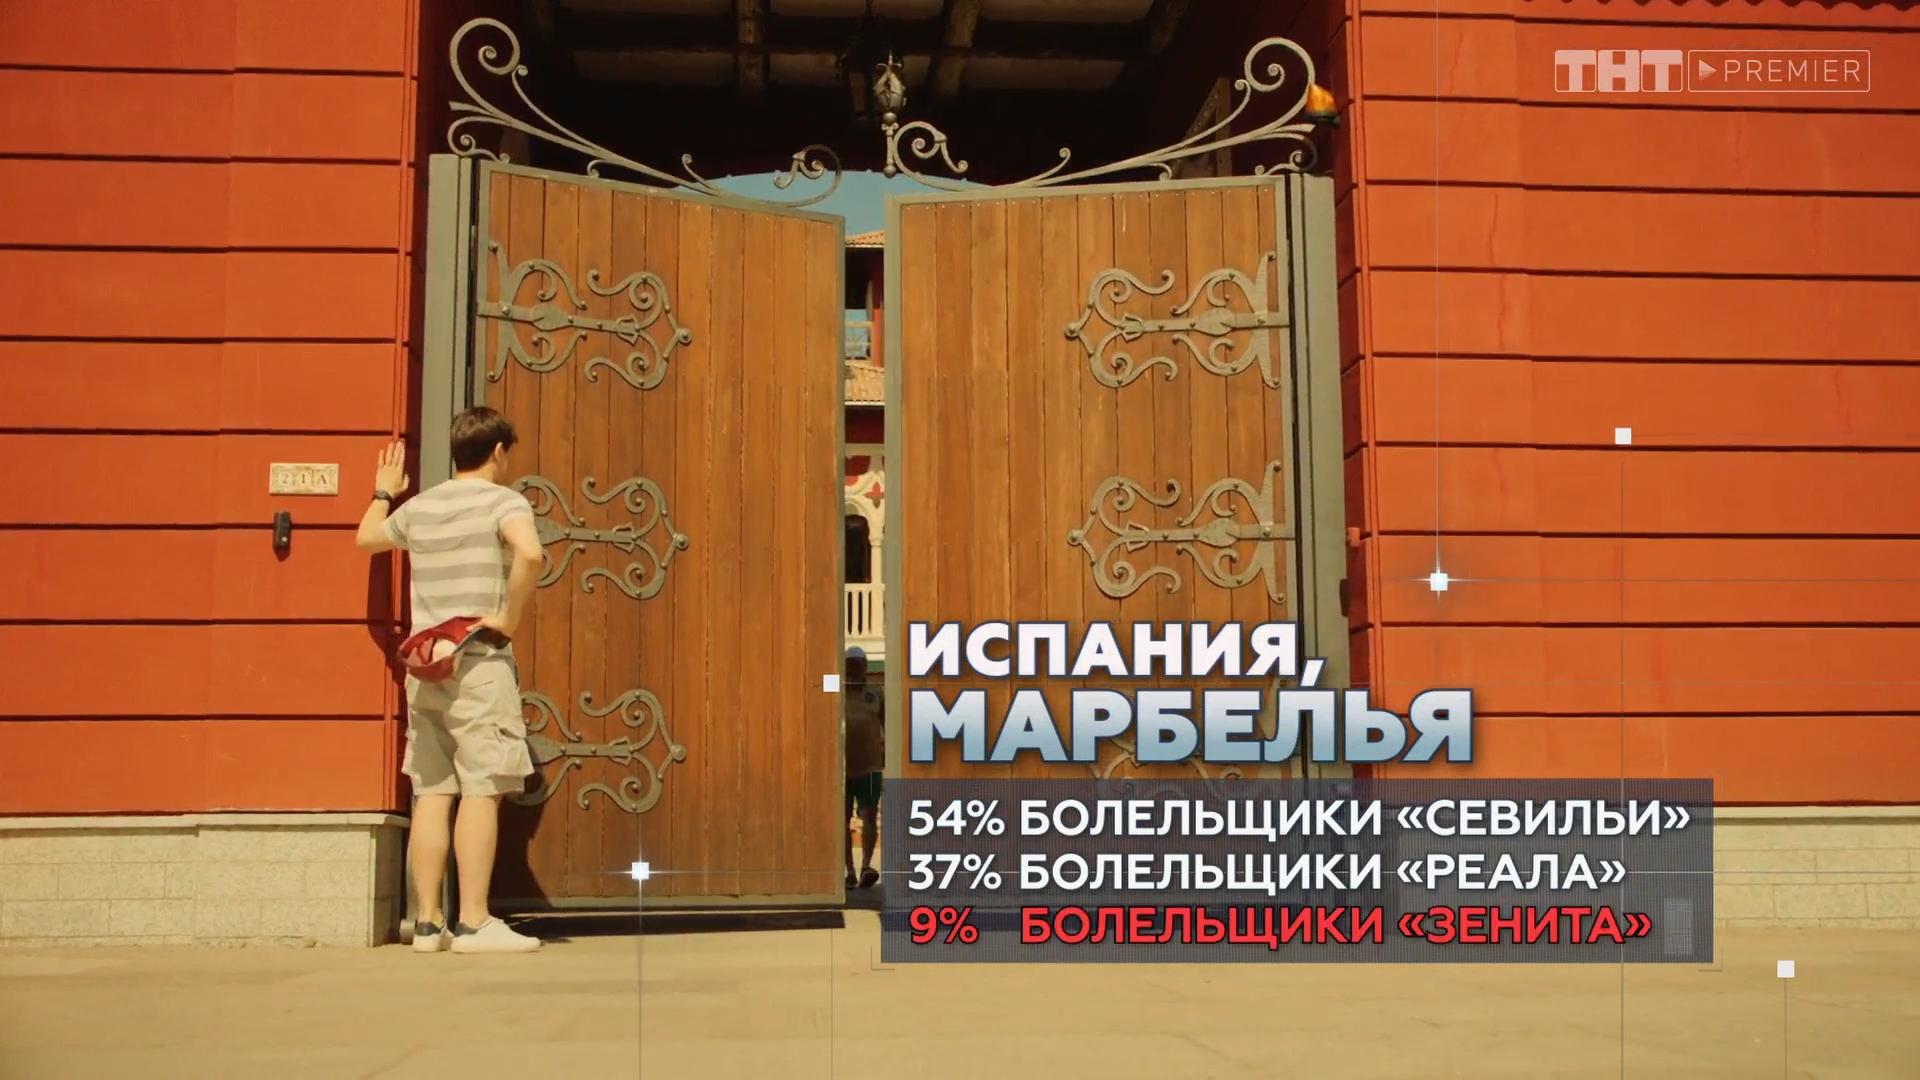 Adaptatsiya.s02e01.2018.WEB-DL.(1080p).Getty.mkv_snapshot_06.31.png